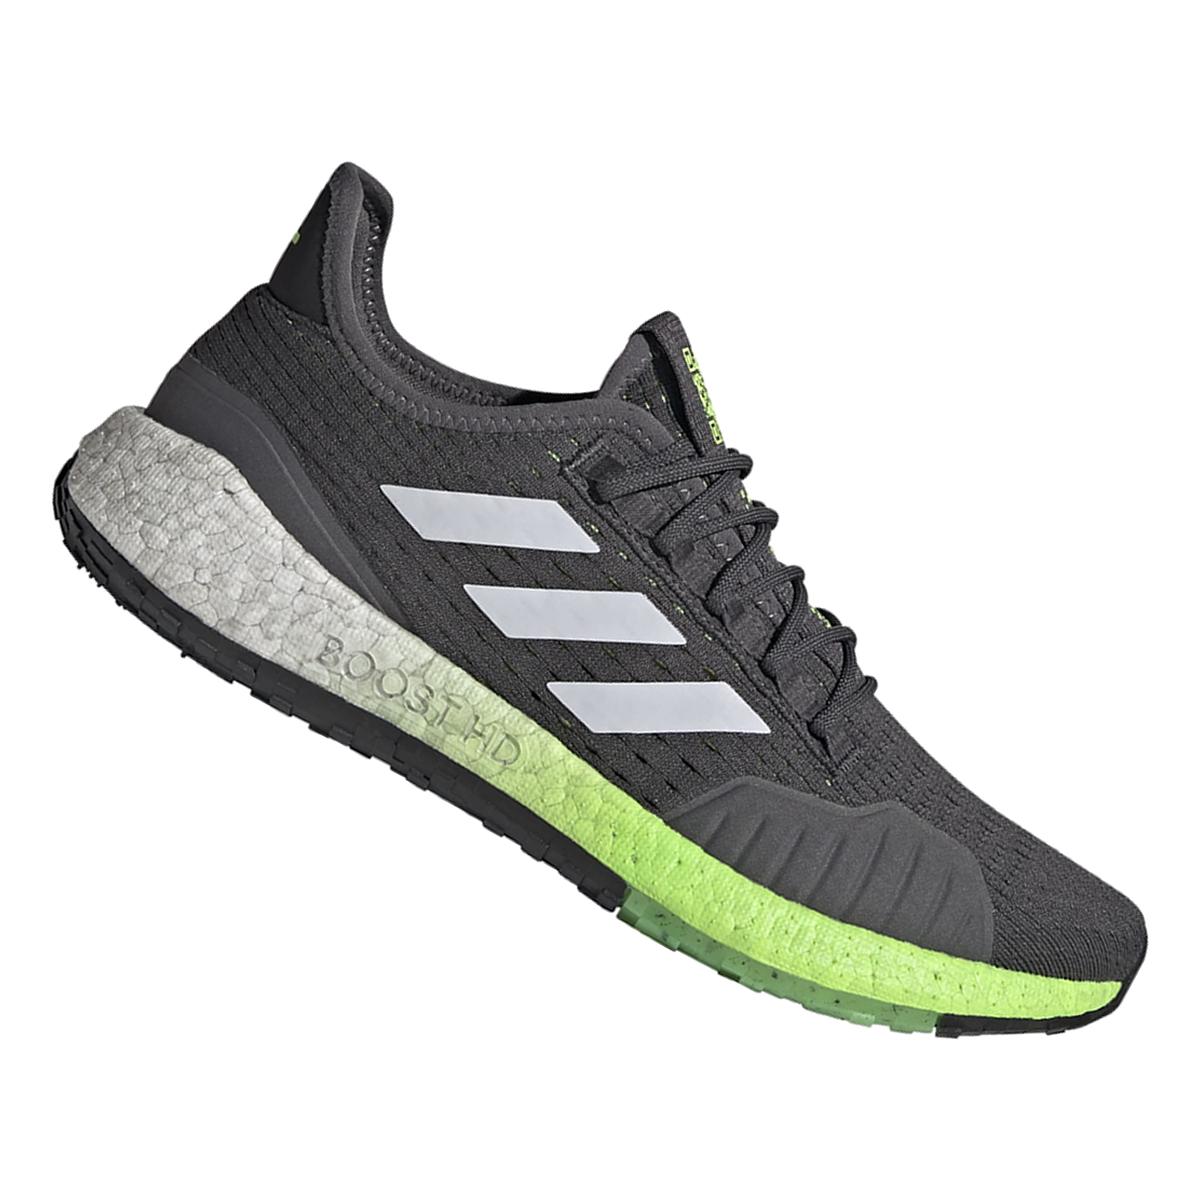 Adidas Laufschuh Pulseboost HD S.Ready dunkelgrau/weiß Gr 39 bis 48